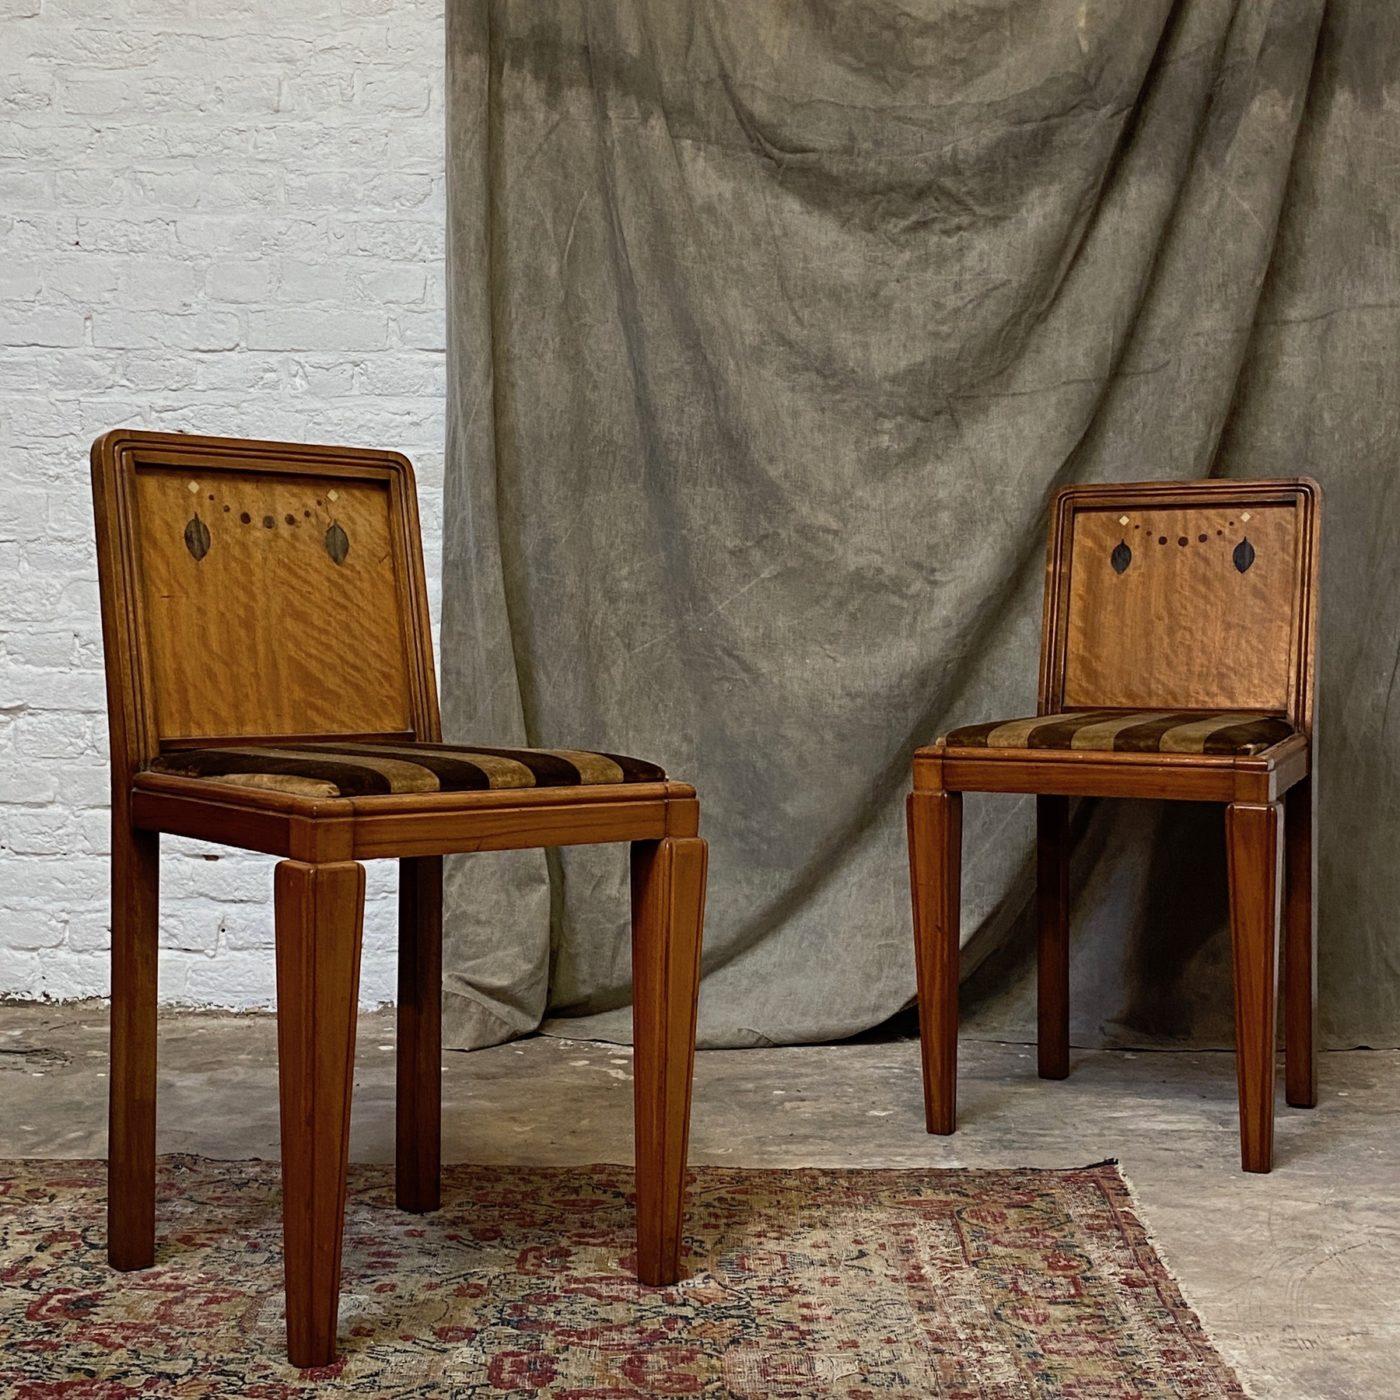 art-deco-chairs0004